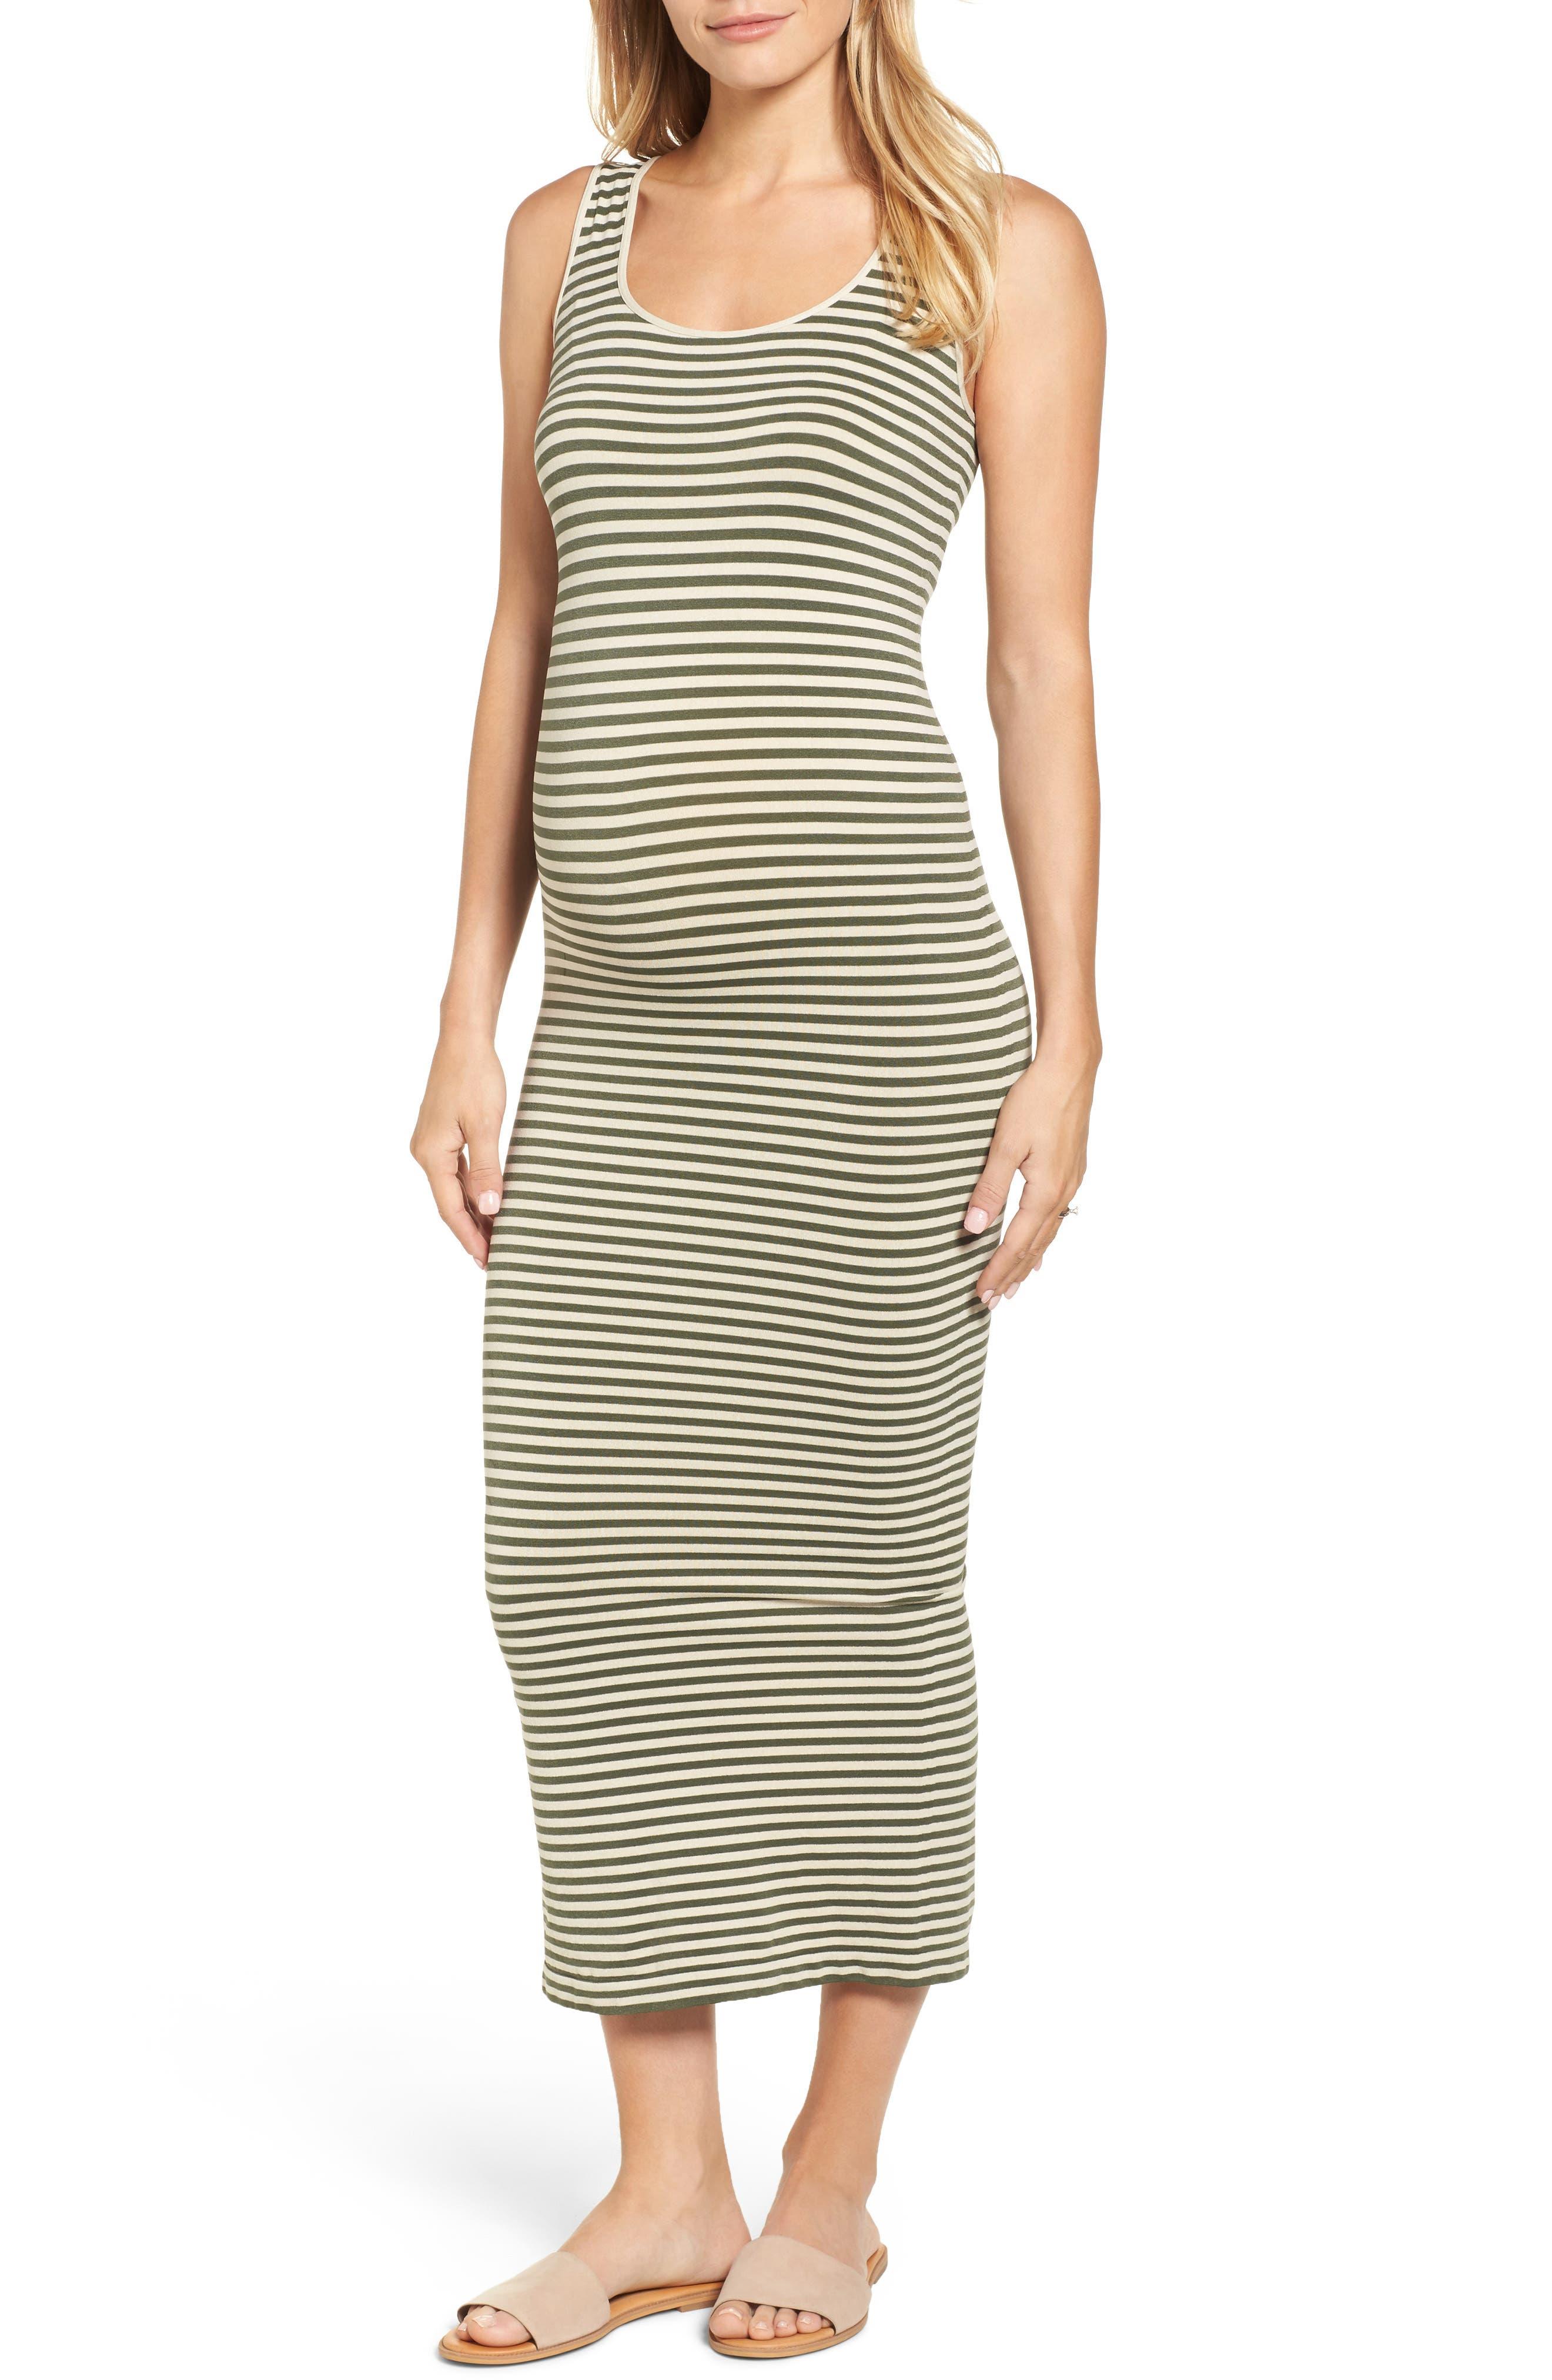 Micro Stripe Maternity Dress,                         Main,                         color, Oatmeal/ Olive